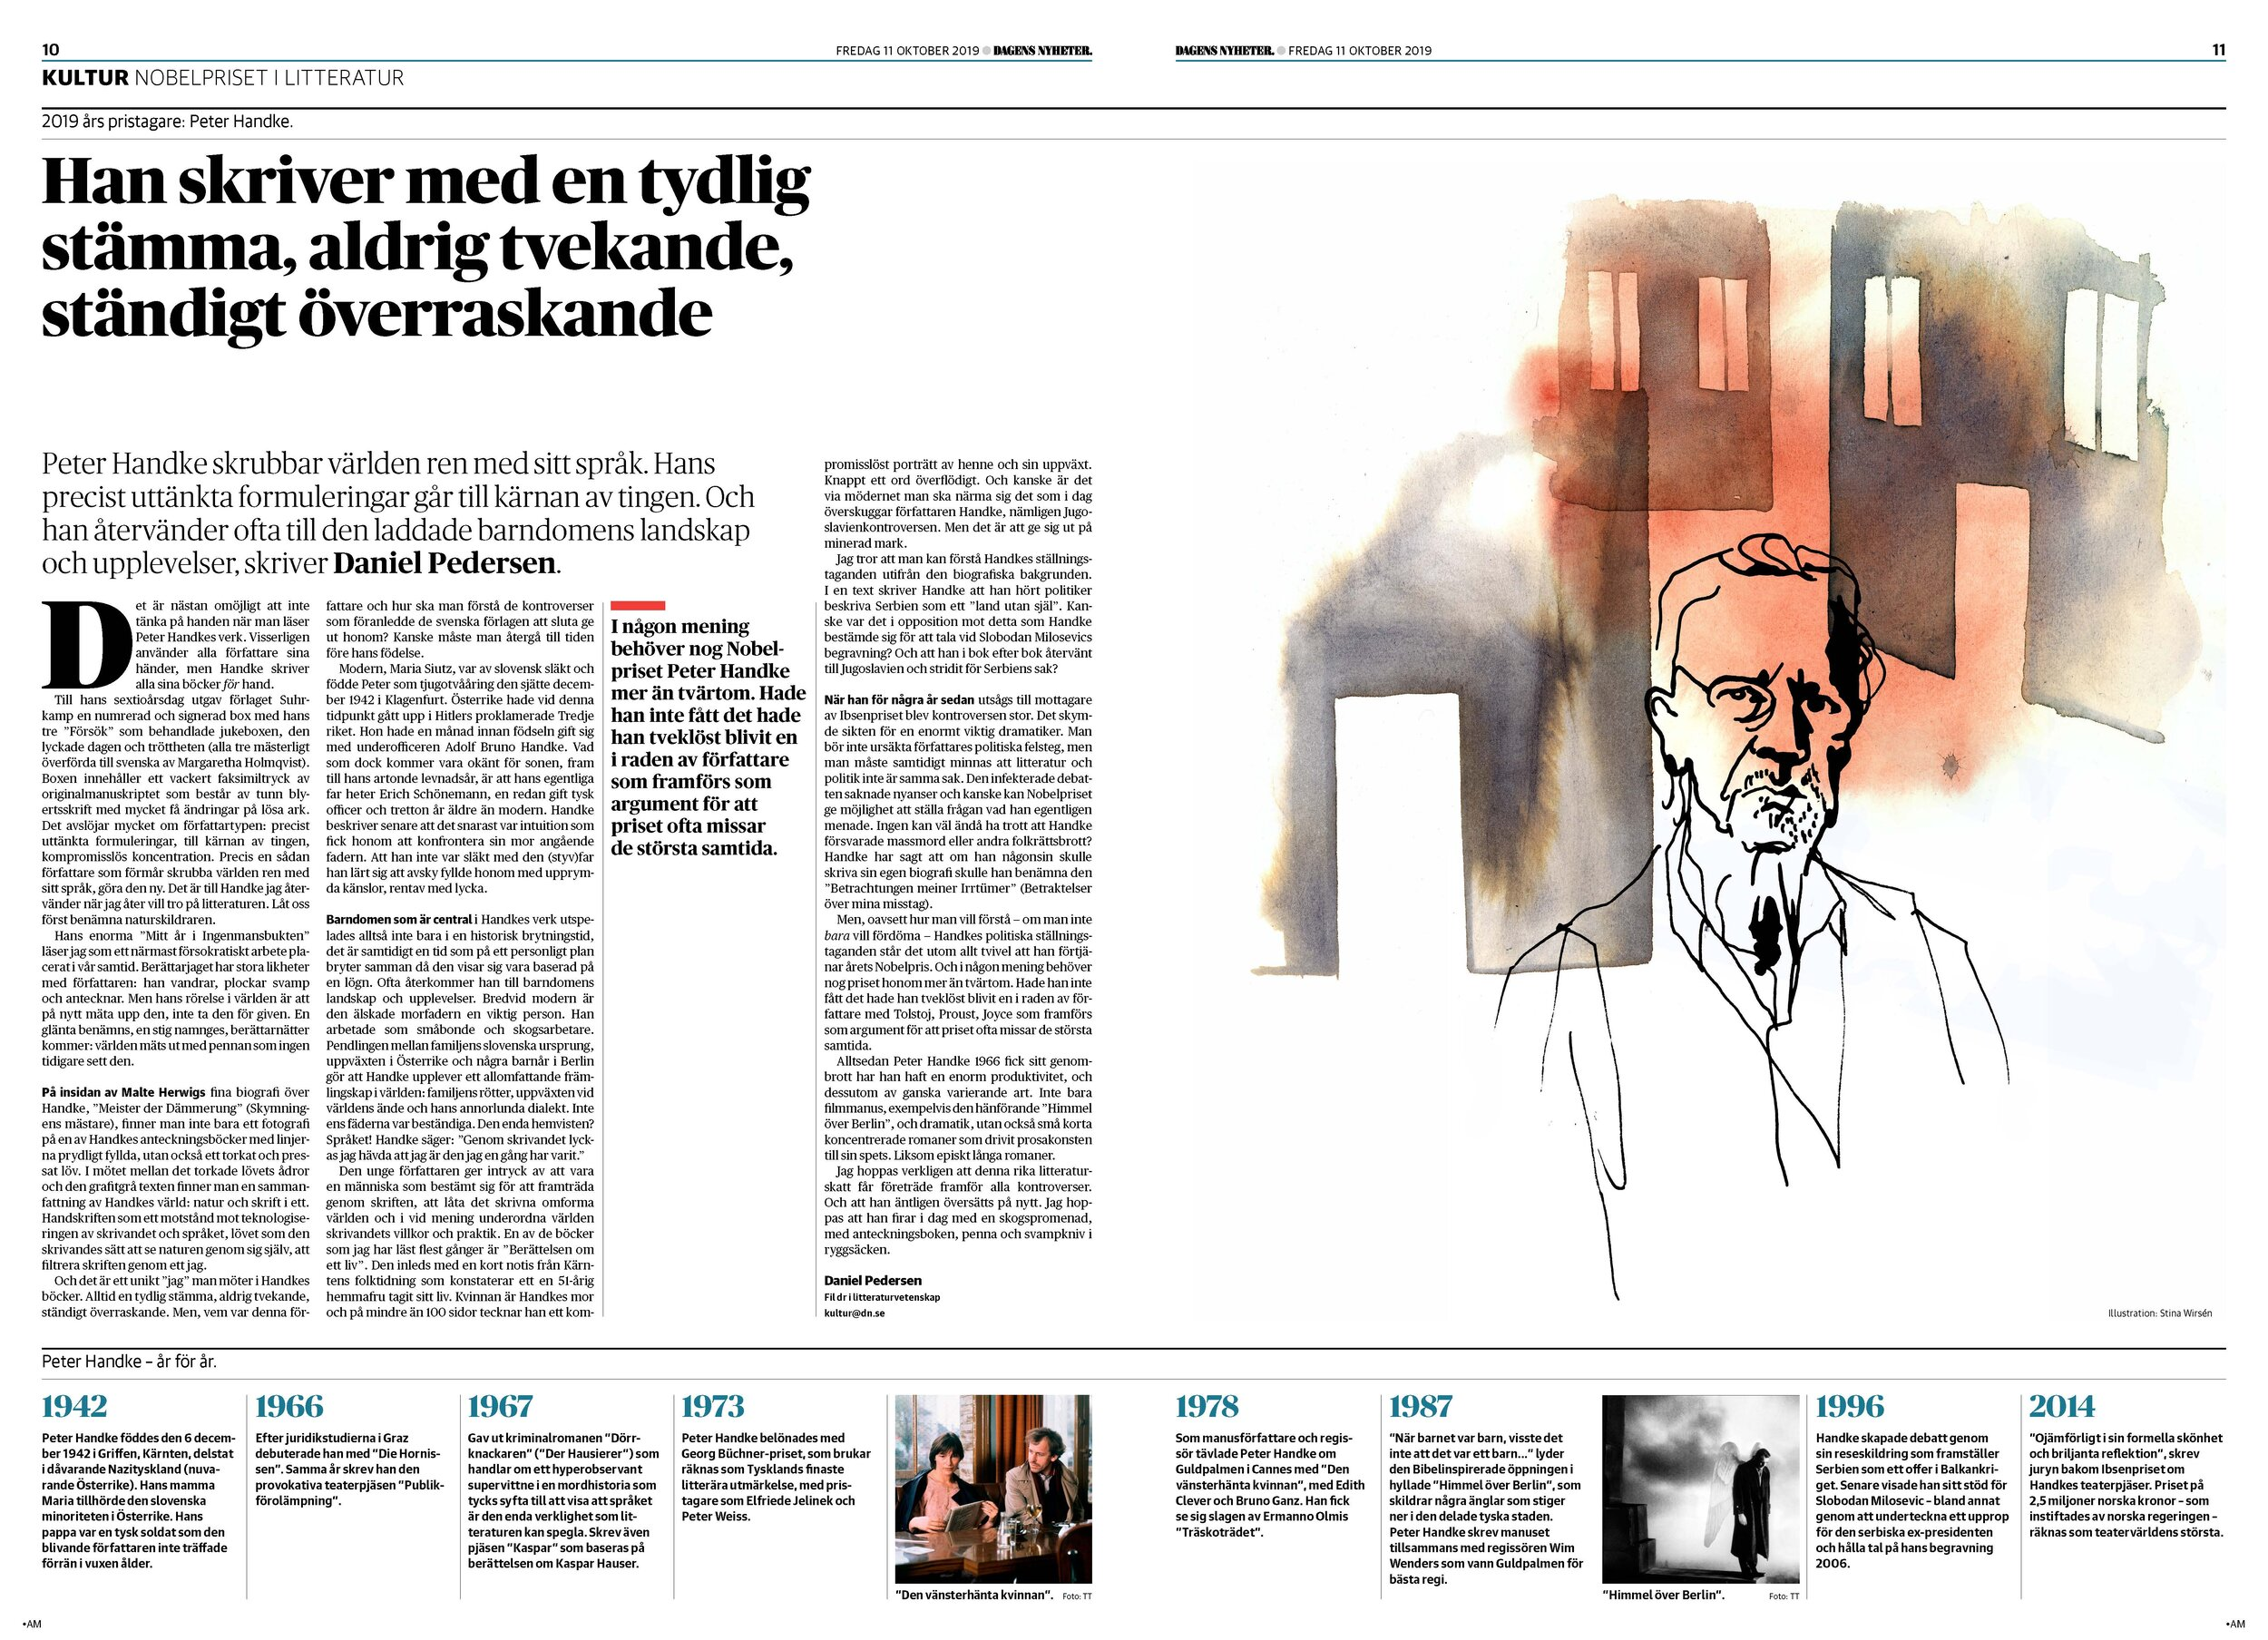 Nobel Peter Handke.jpg